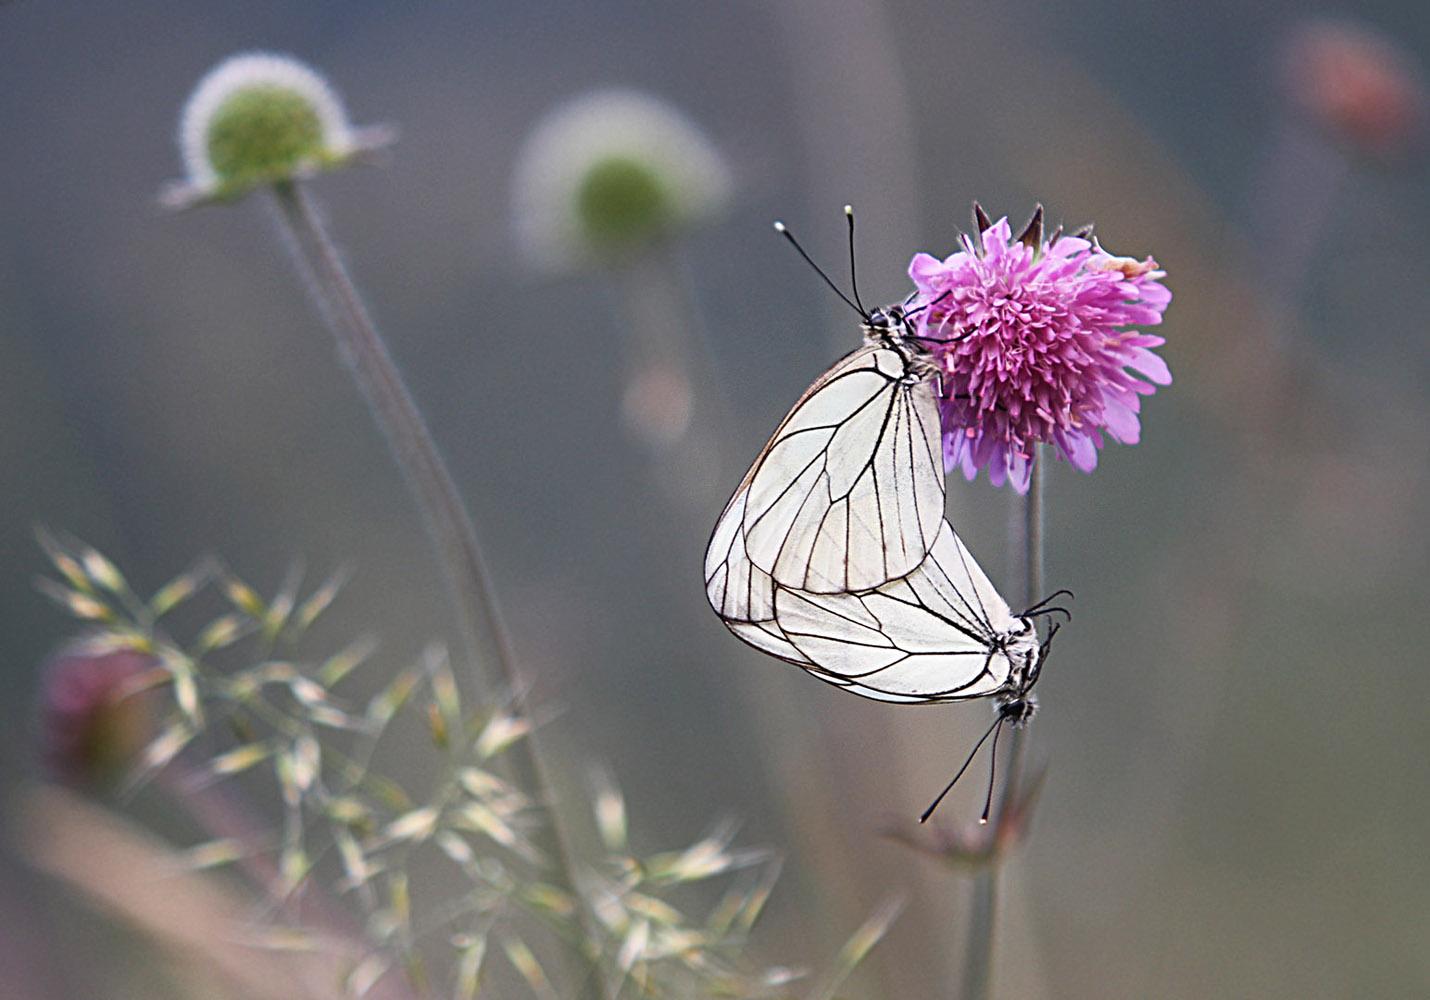 Jelena Djurdjevic - Butterflies in love